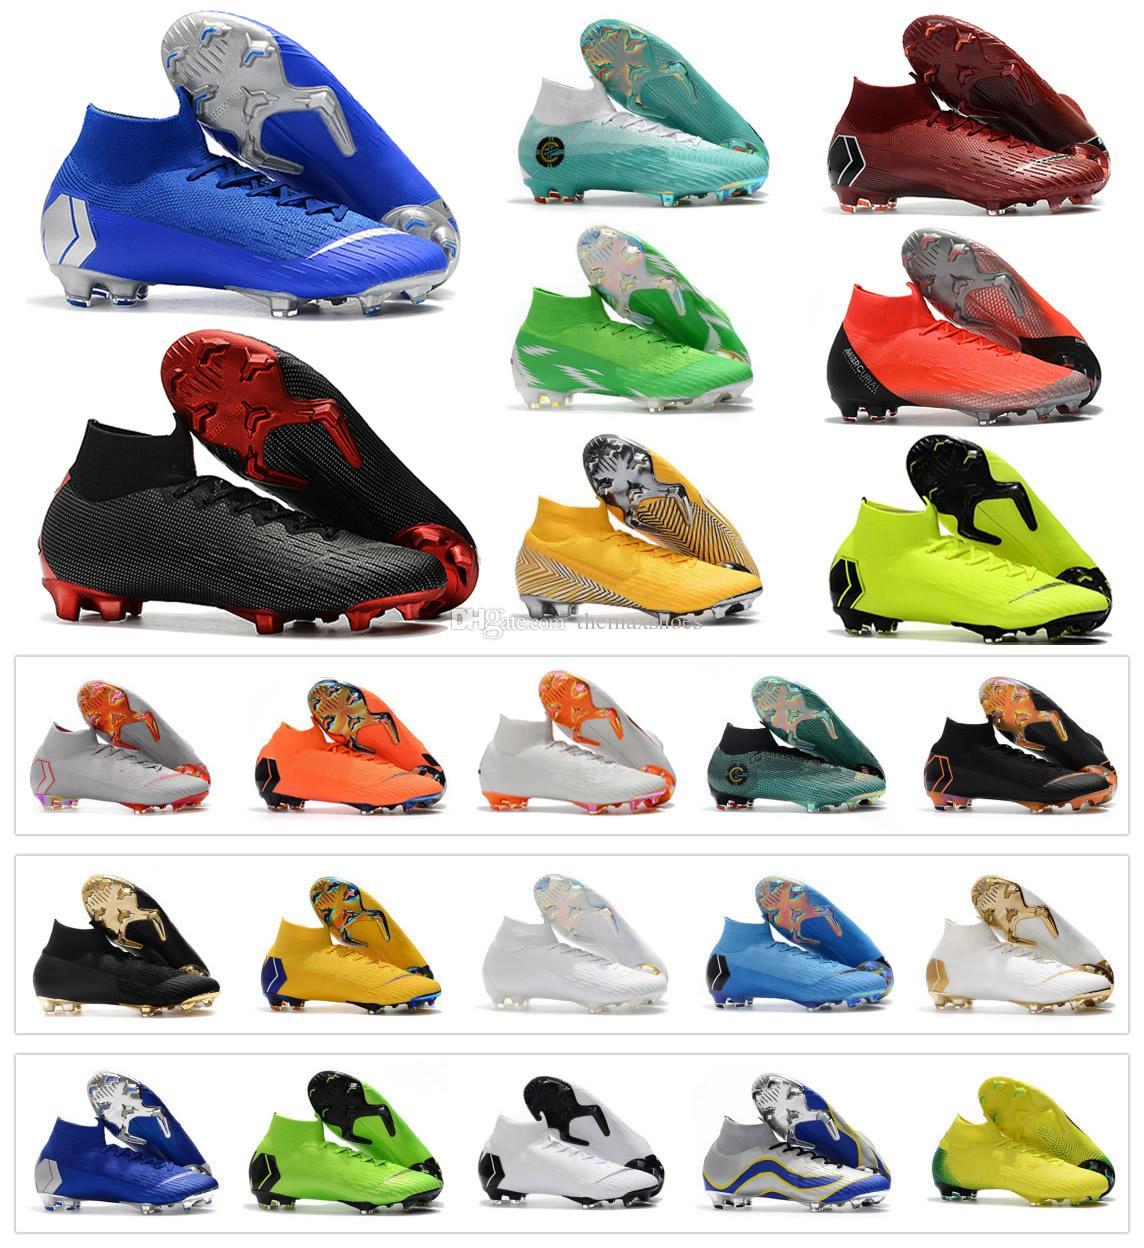 bae8803a6 2019 Hot Mercurial Superfly VI 360 Elite FG KJ 6 XII 12 CR7 Ronaldo Neymar  Mens Women Boys High Soccer Shoes Football Boots Cleats Size 35 45 From ...